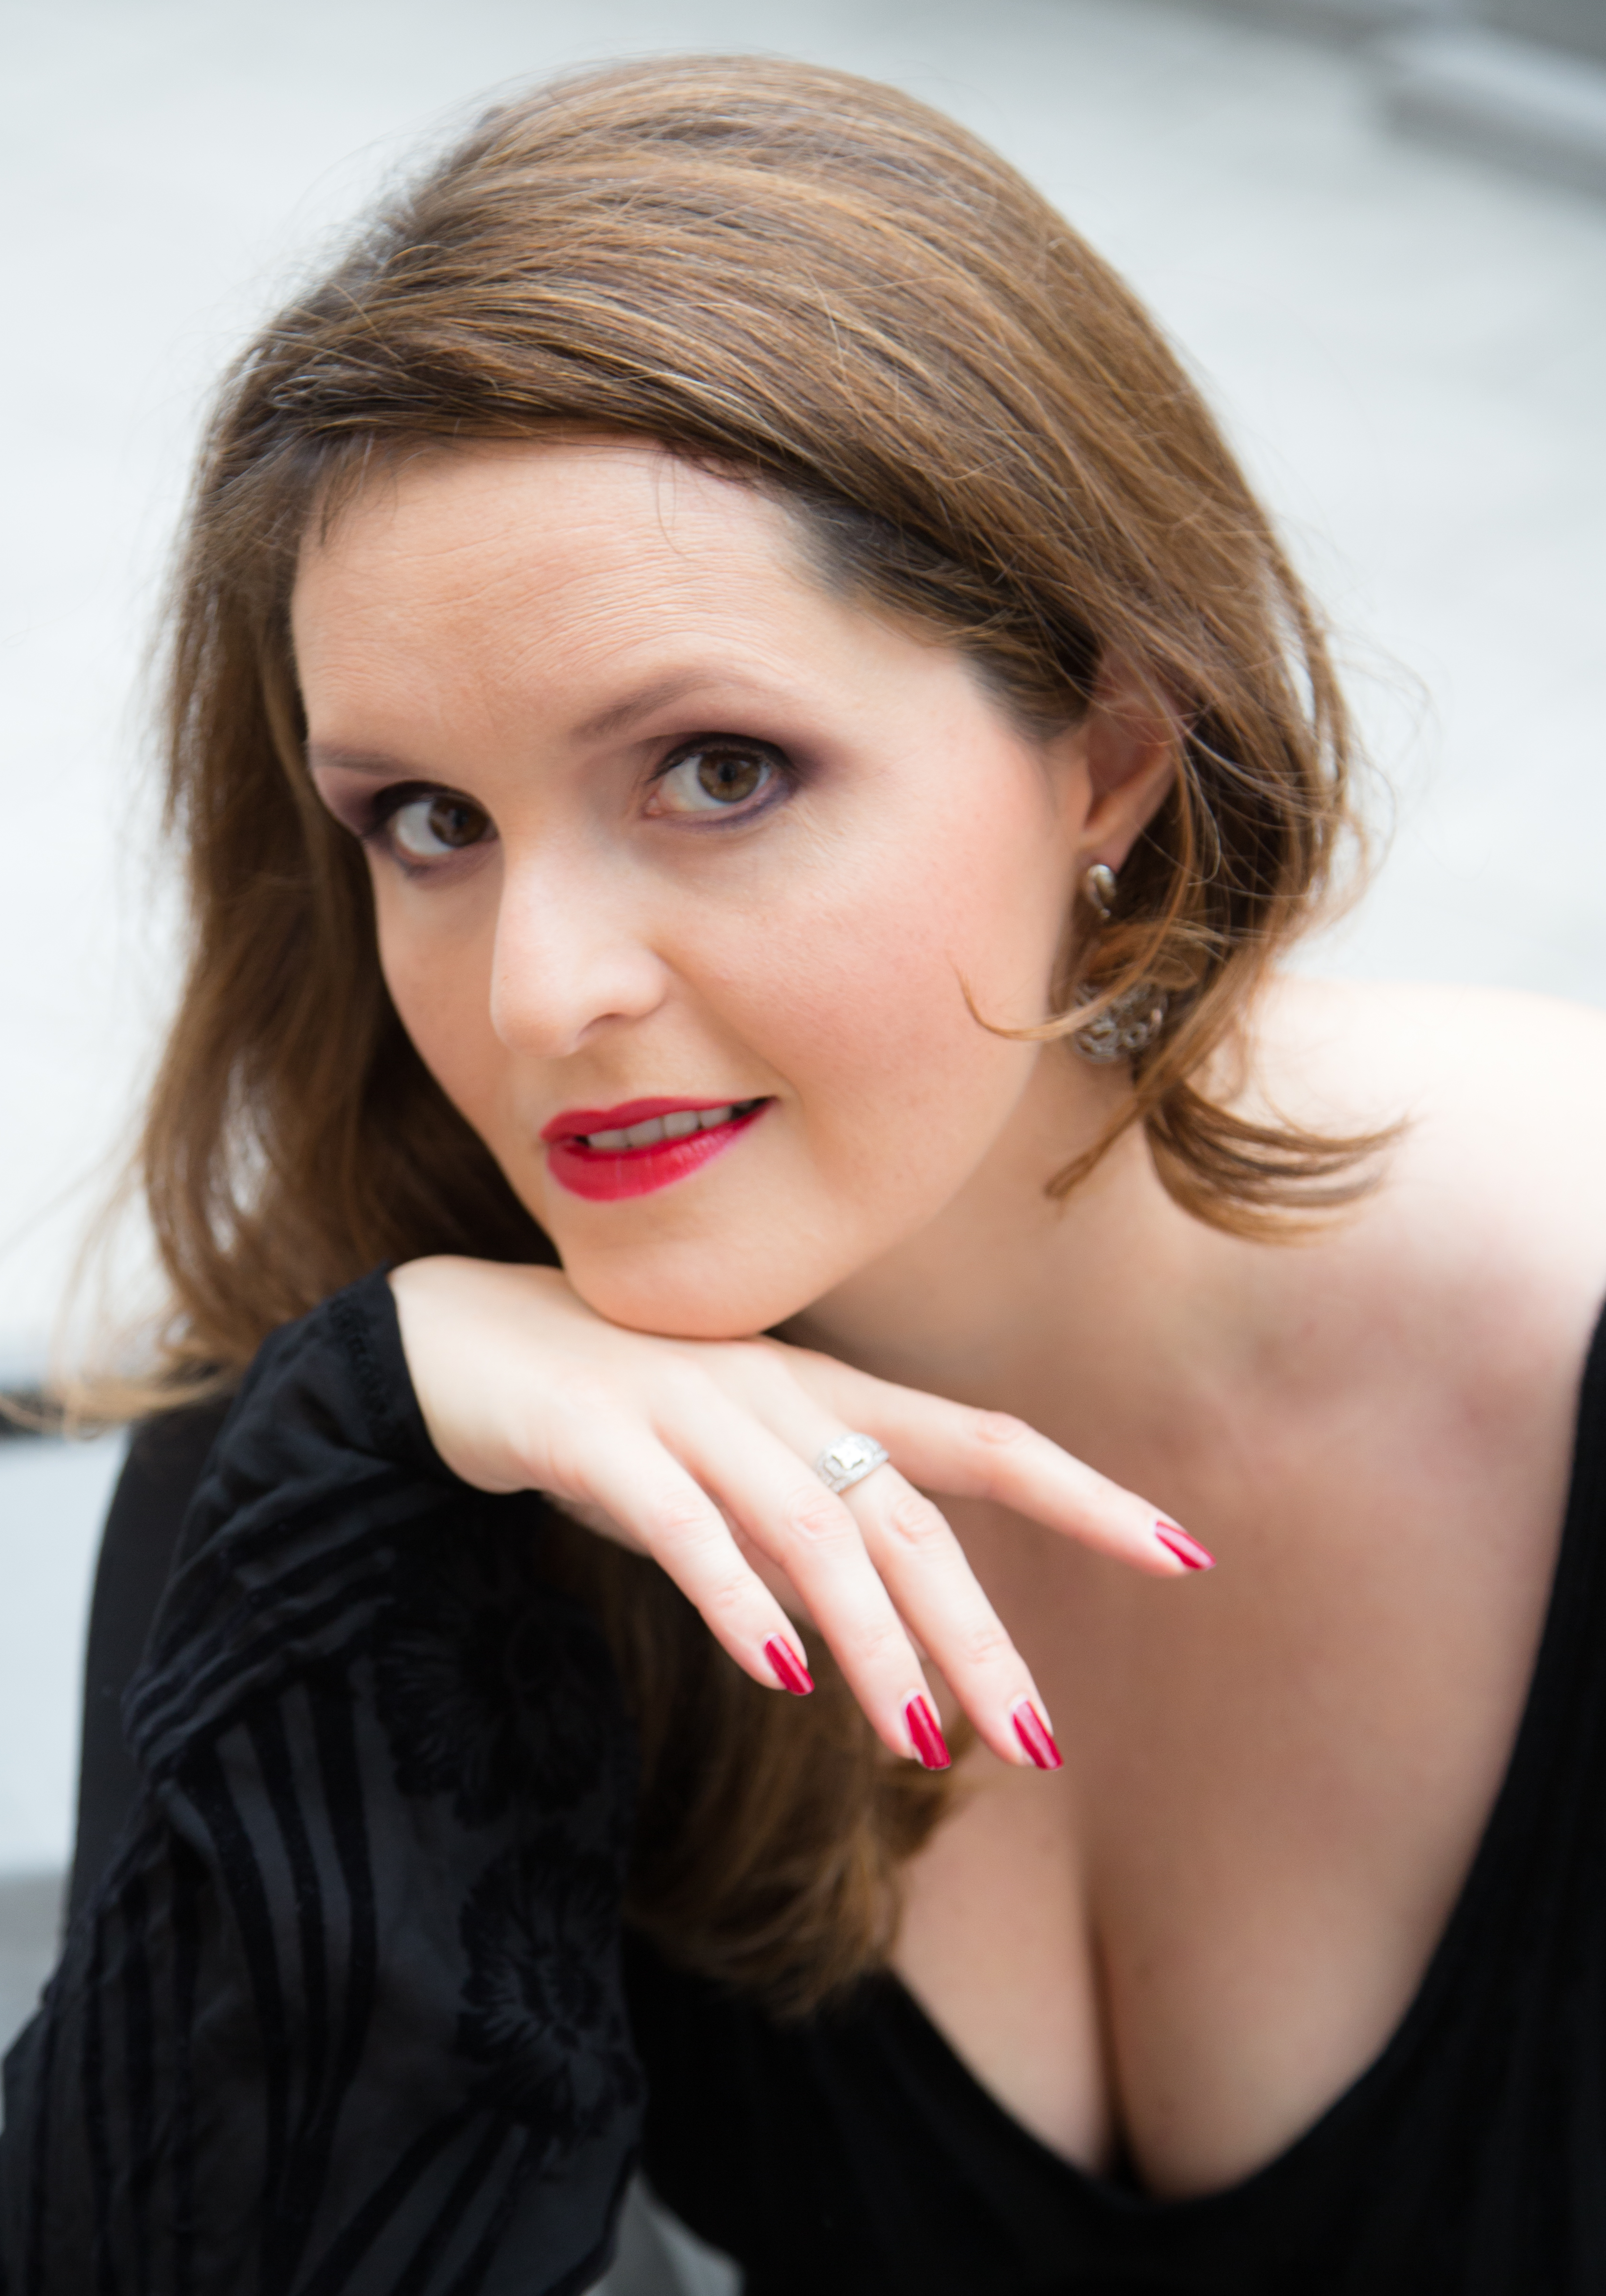 Sandra Orlow Pictures and Videos - PeachyForum